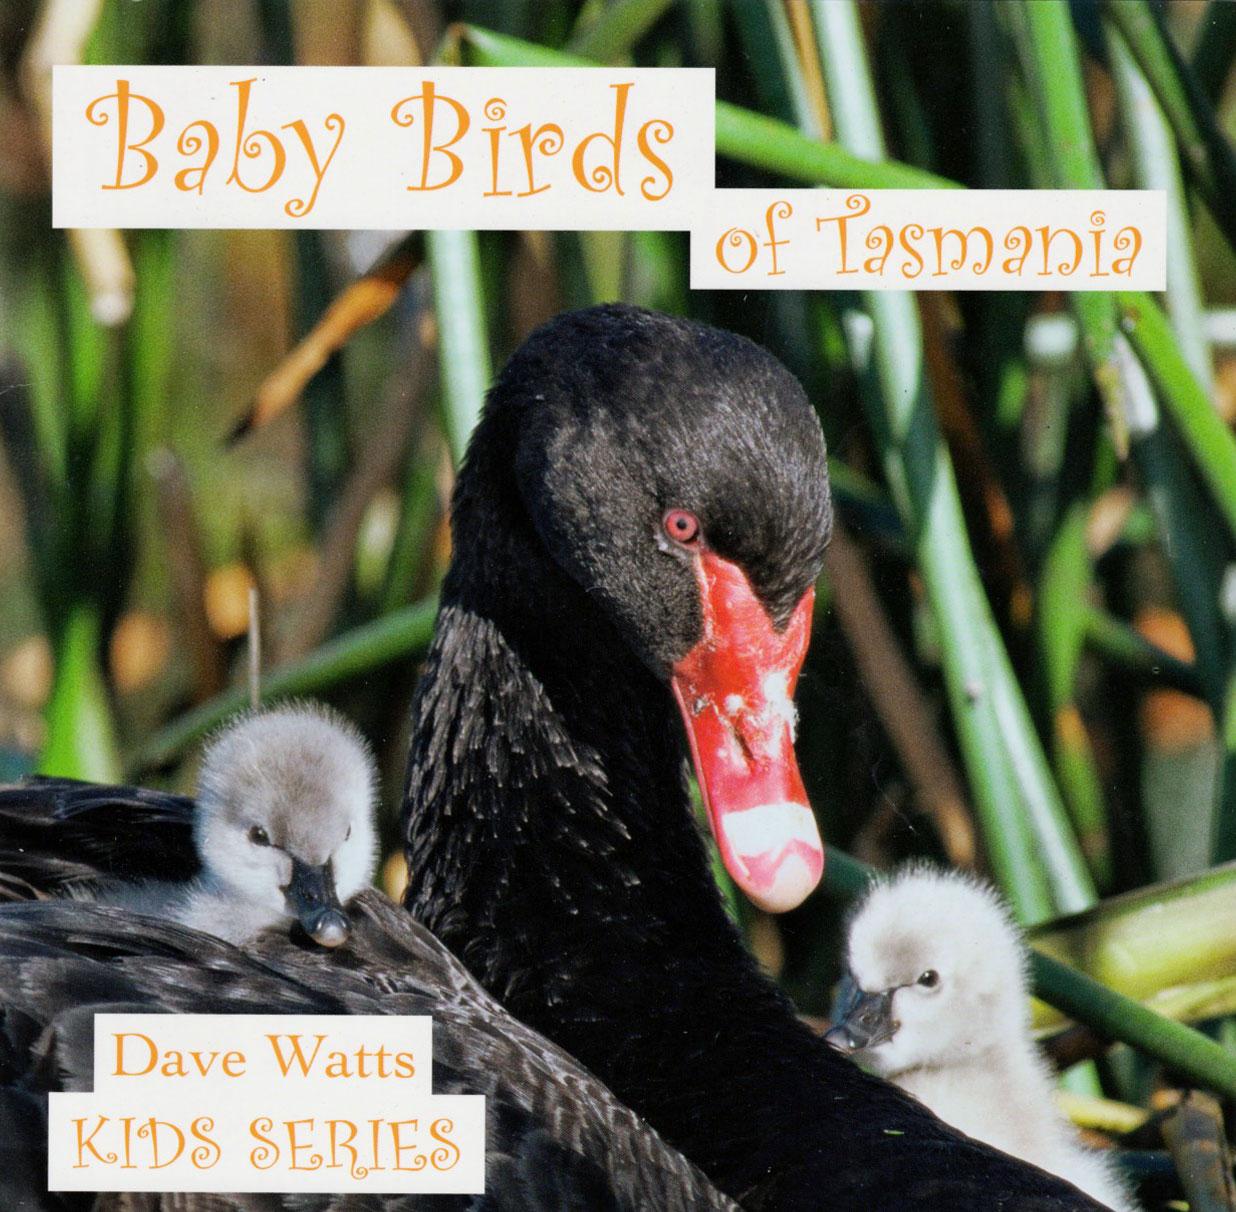 Baby Birds of Tasmania - Kids Series